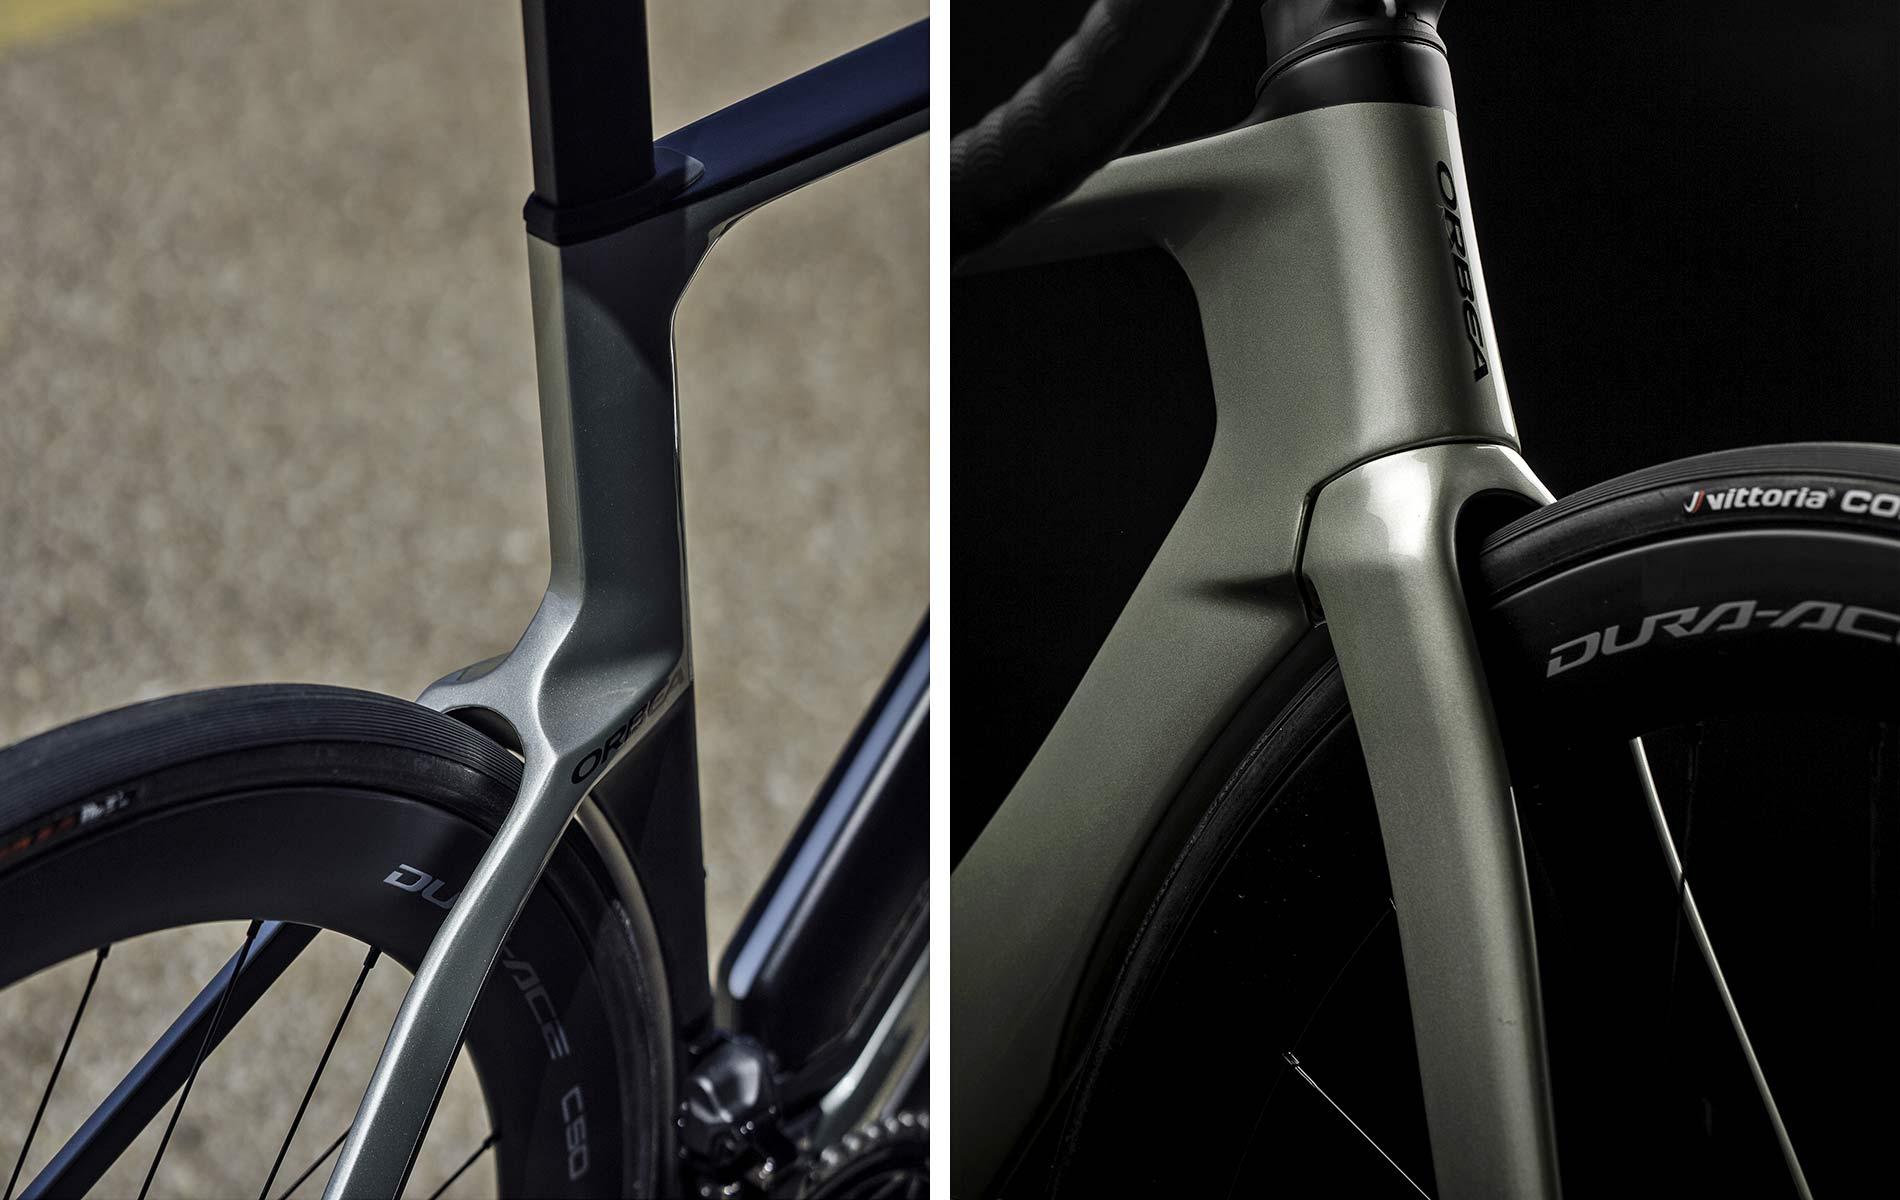 2022 Orbea Orca Aero carbon road bike, tire details